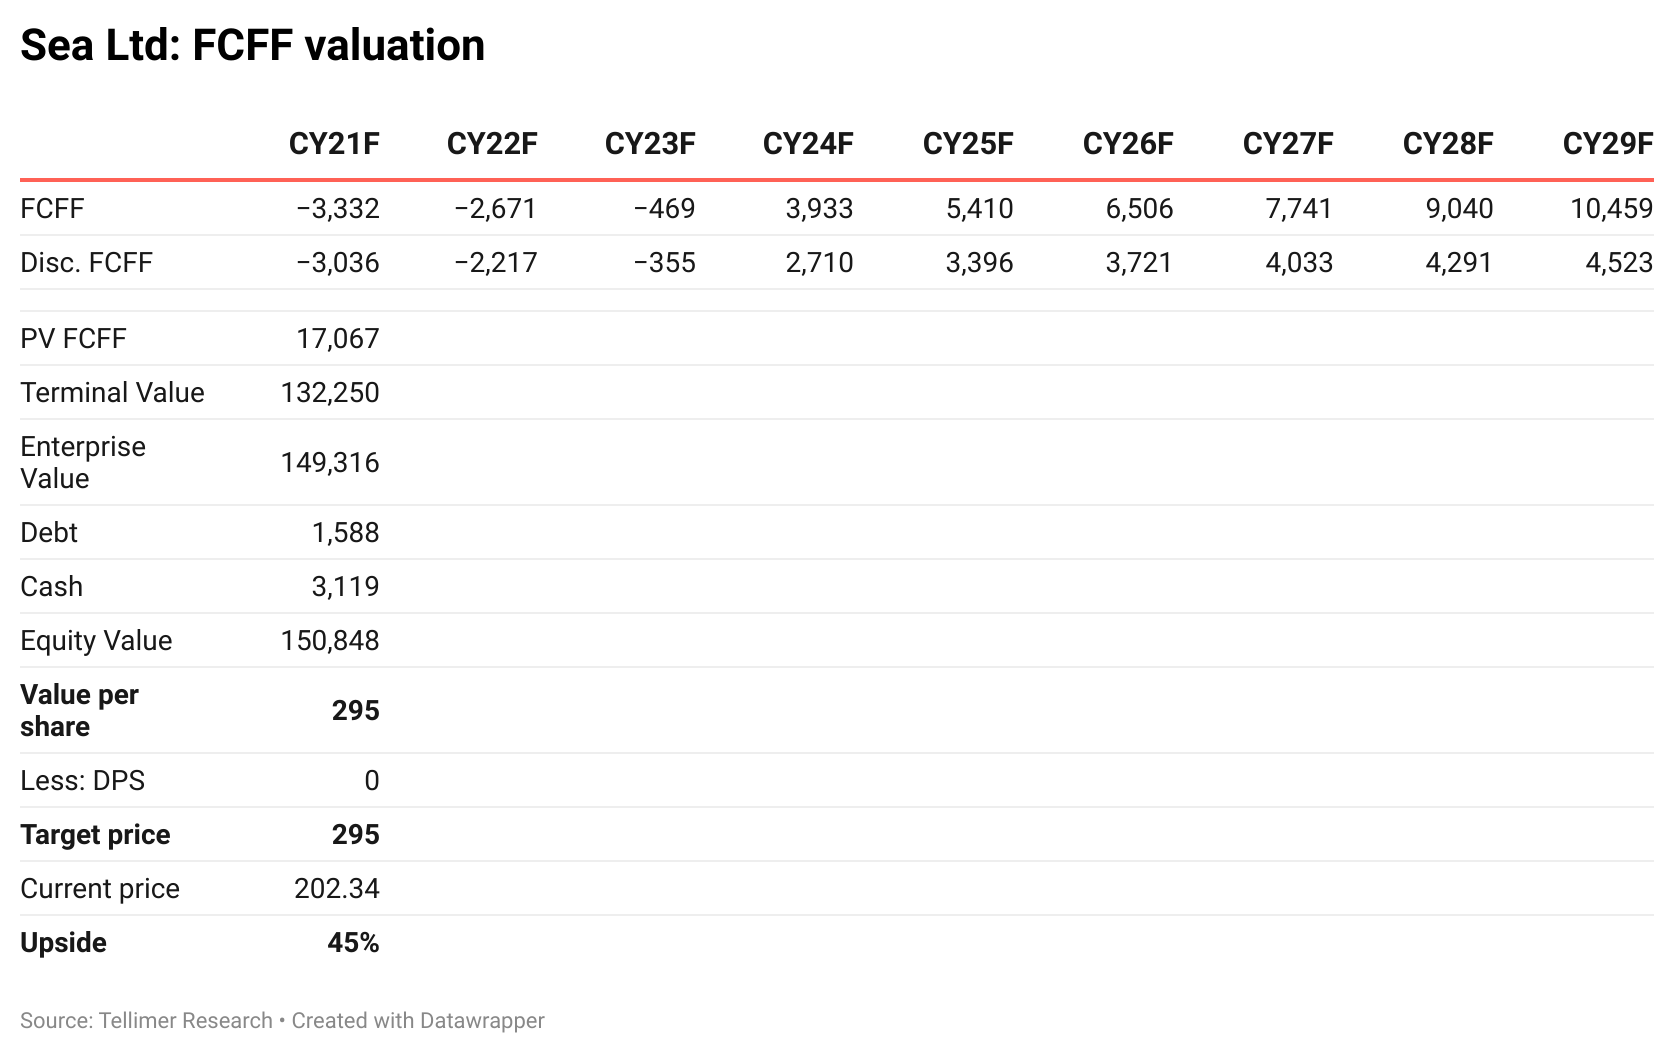 Sea Ltd: FCFF valuation